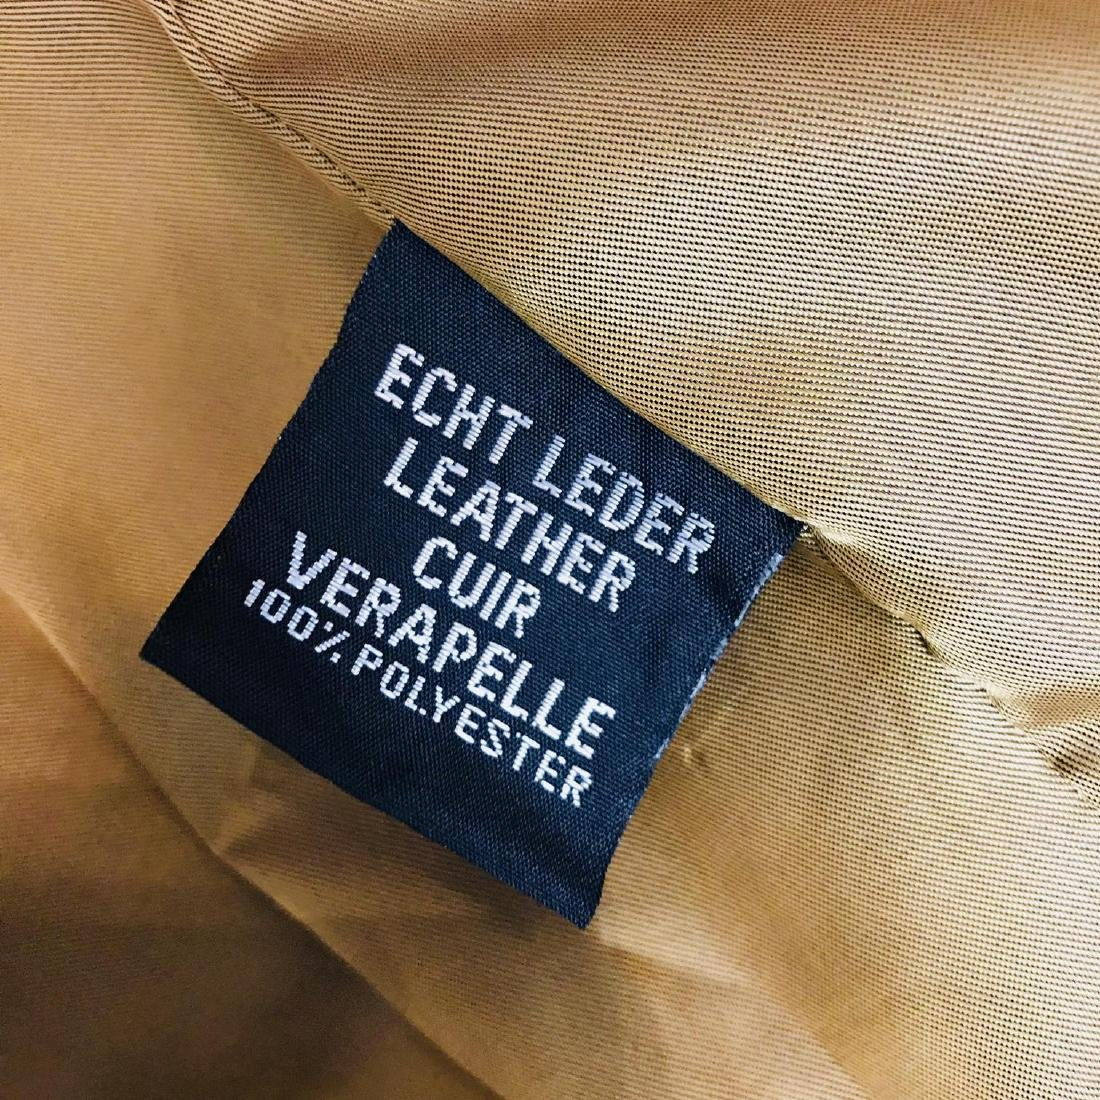 Vintage Men's Brown Suede Leather Jacket Coat Size 40 - 8